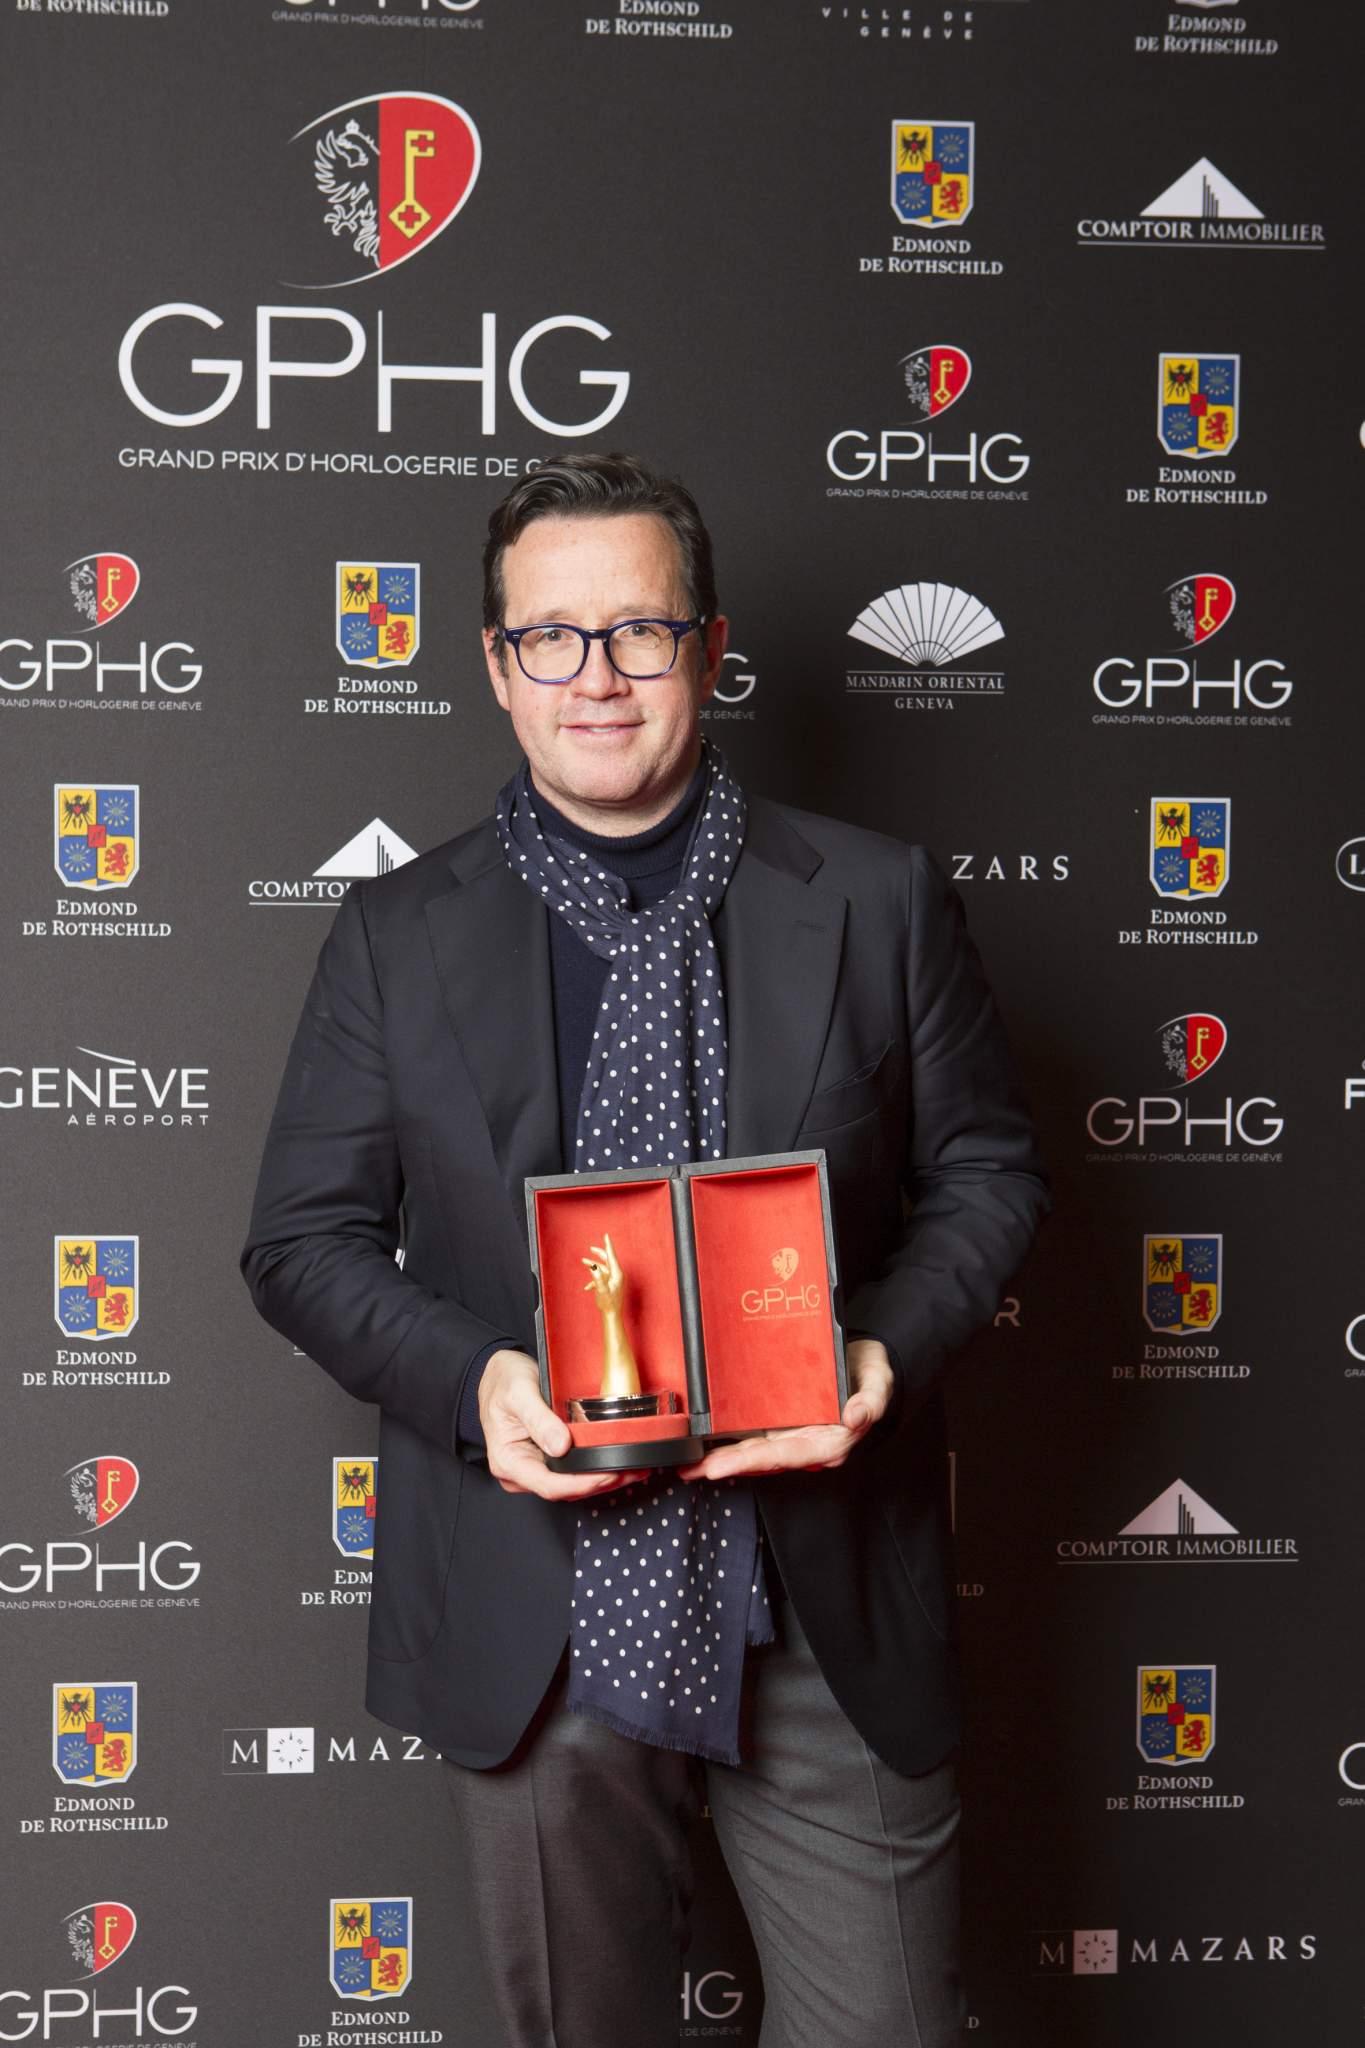 François Bennahmias (CEO of Audemars Piguet, winner of the Mechanical Exception Watch Prize 2016)